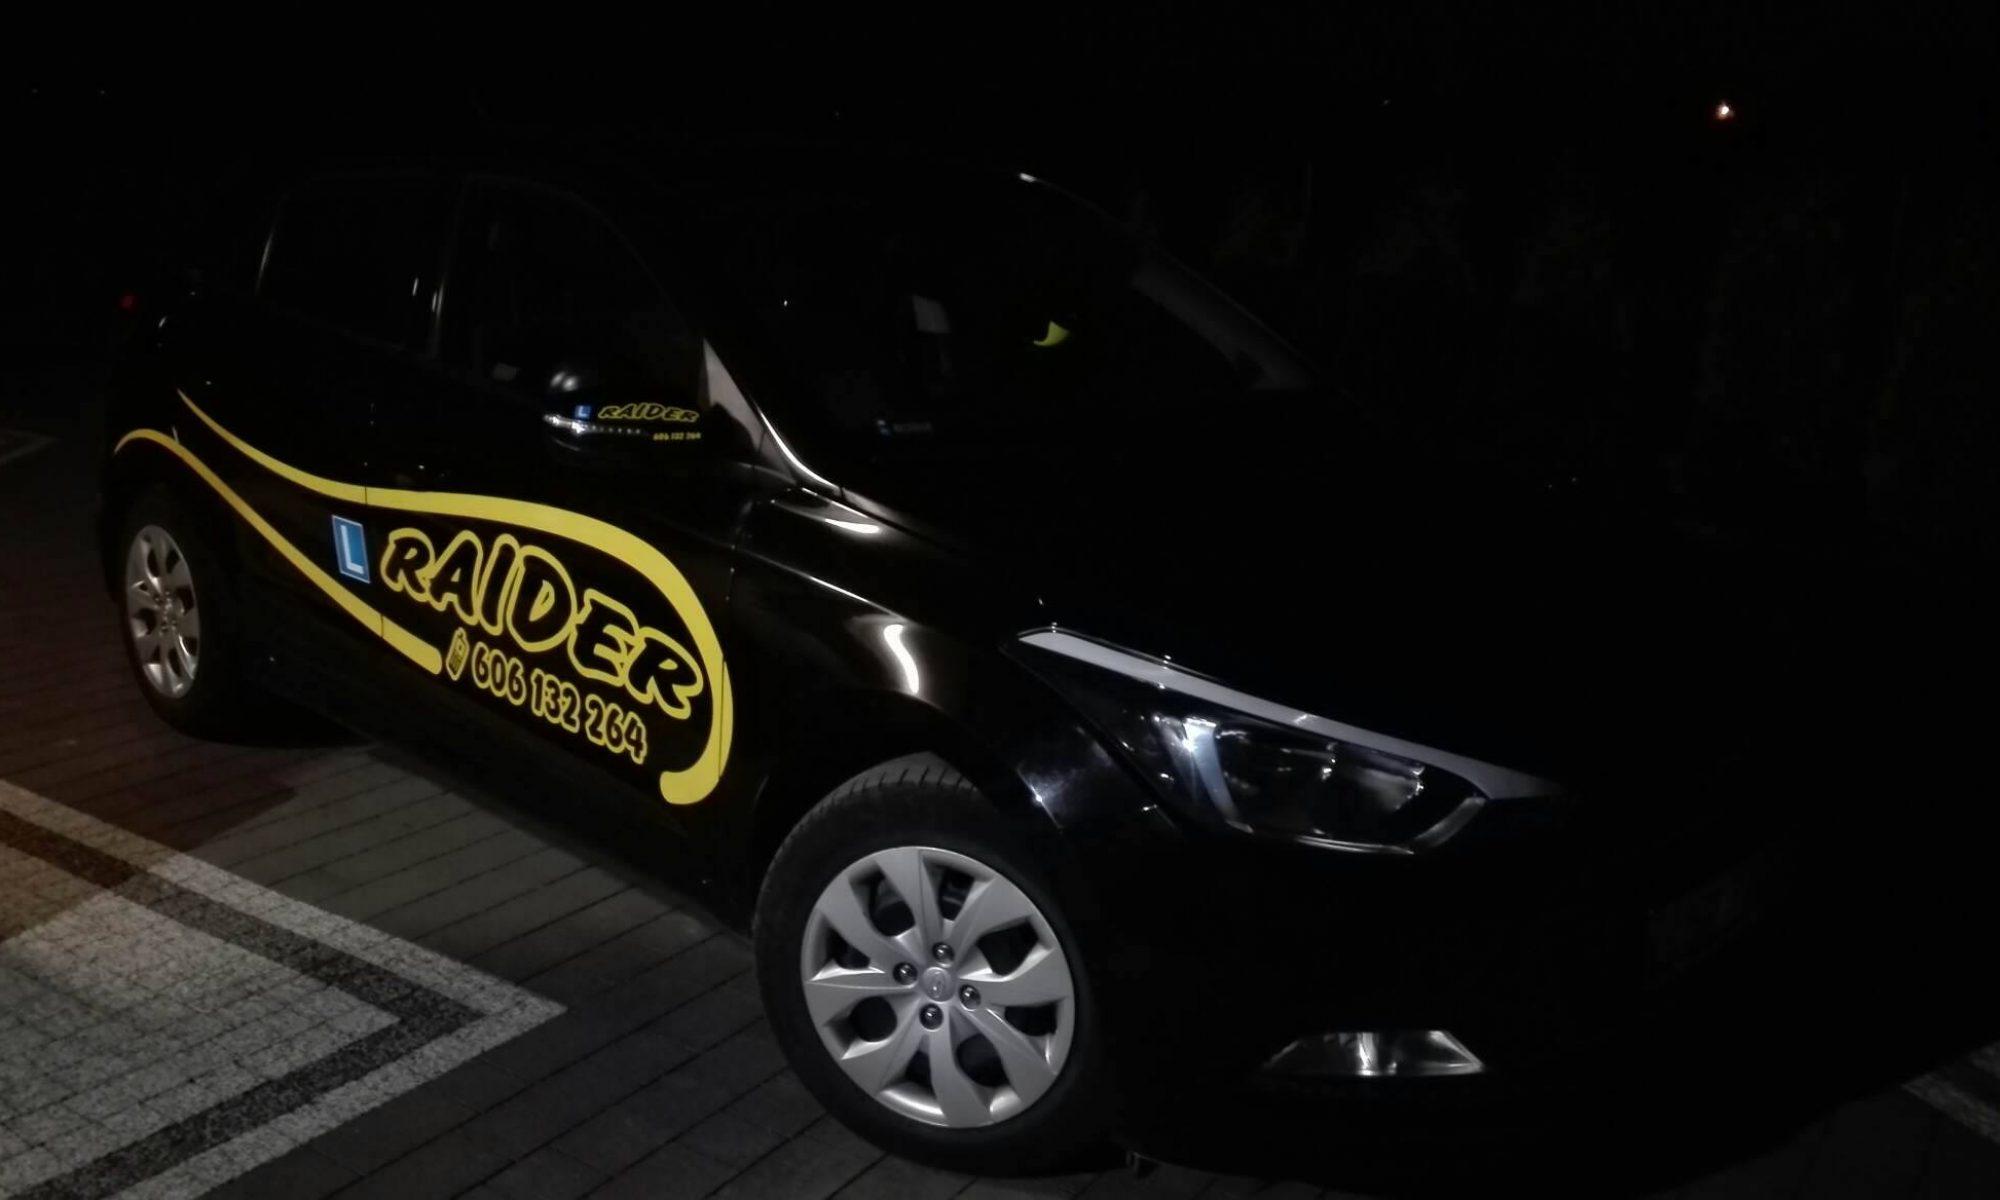 Raider OSK